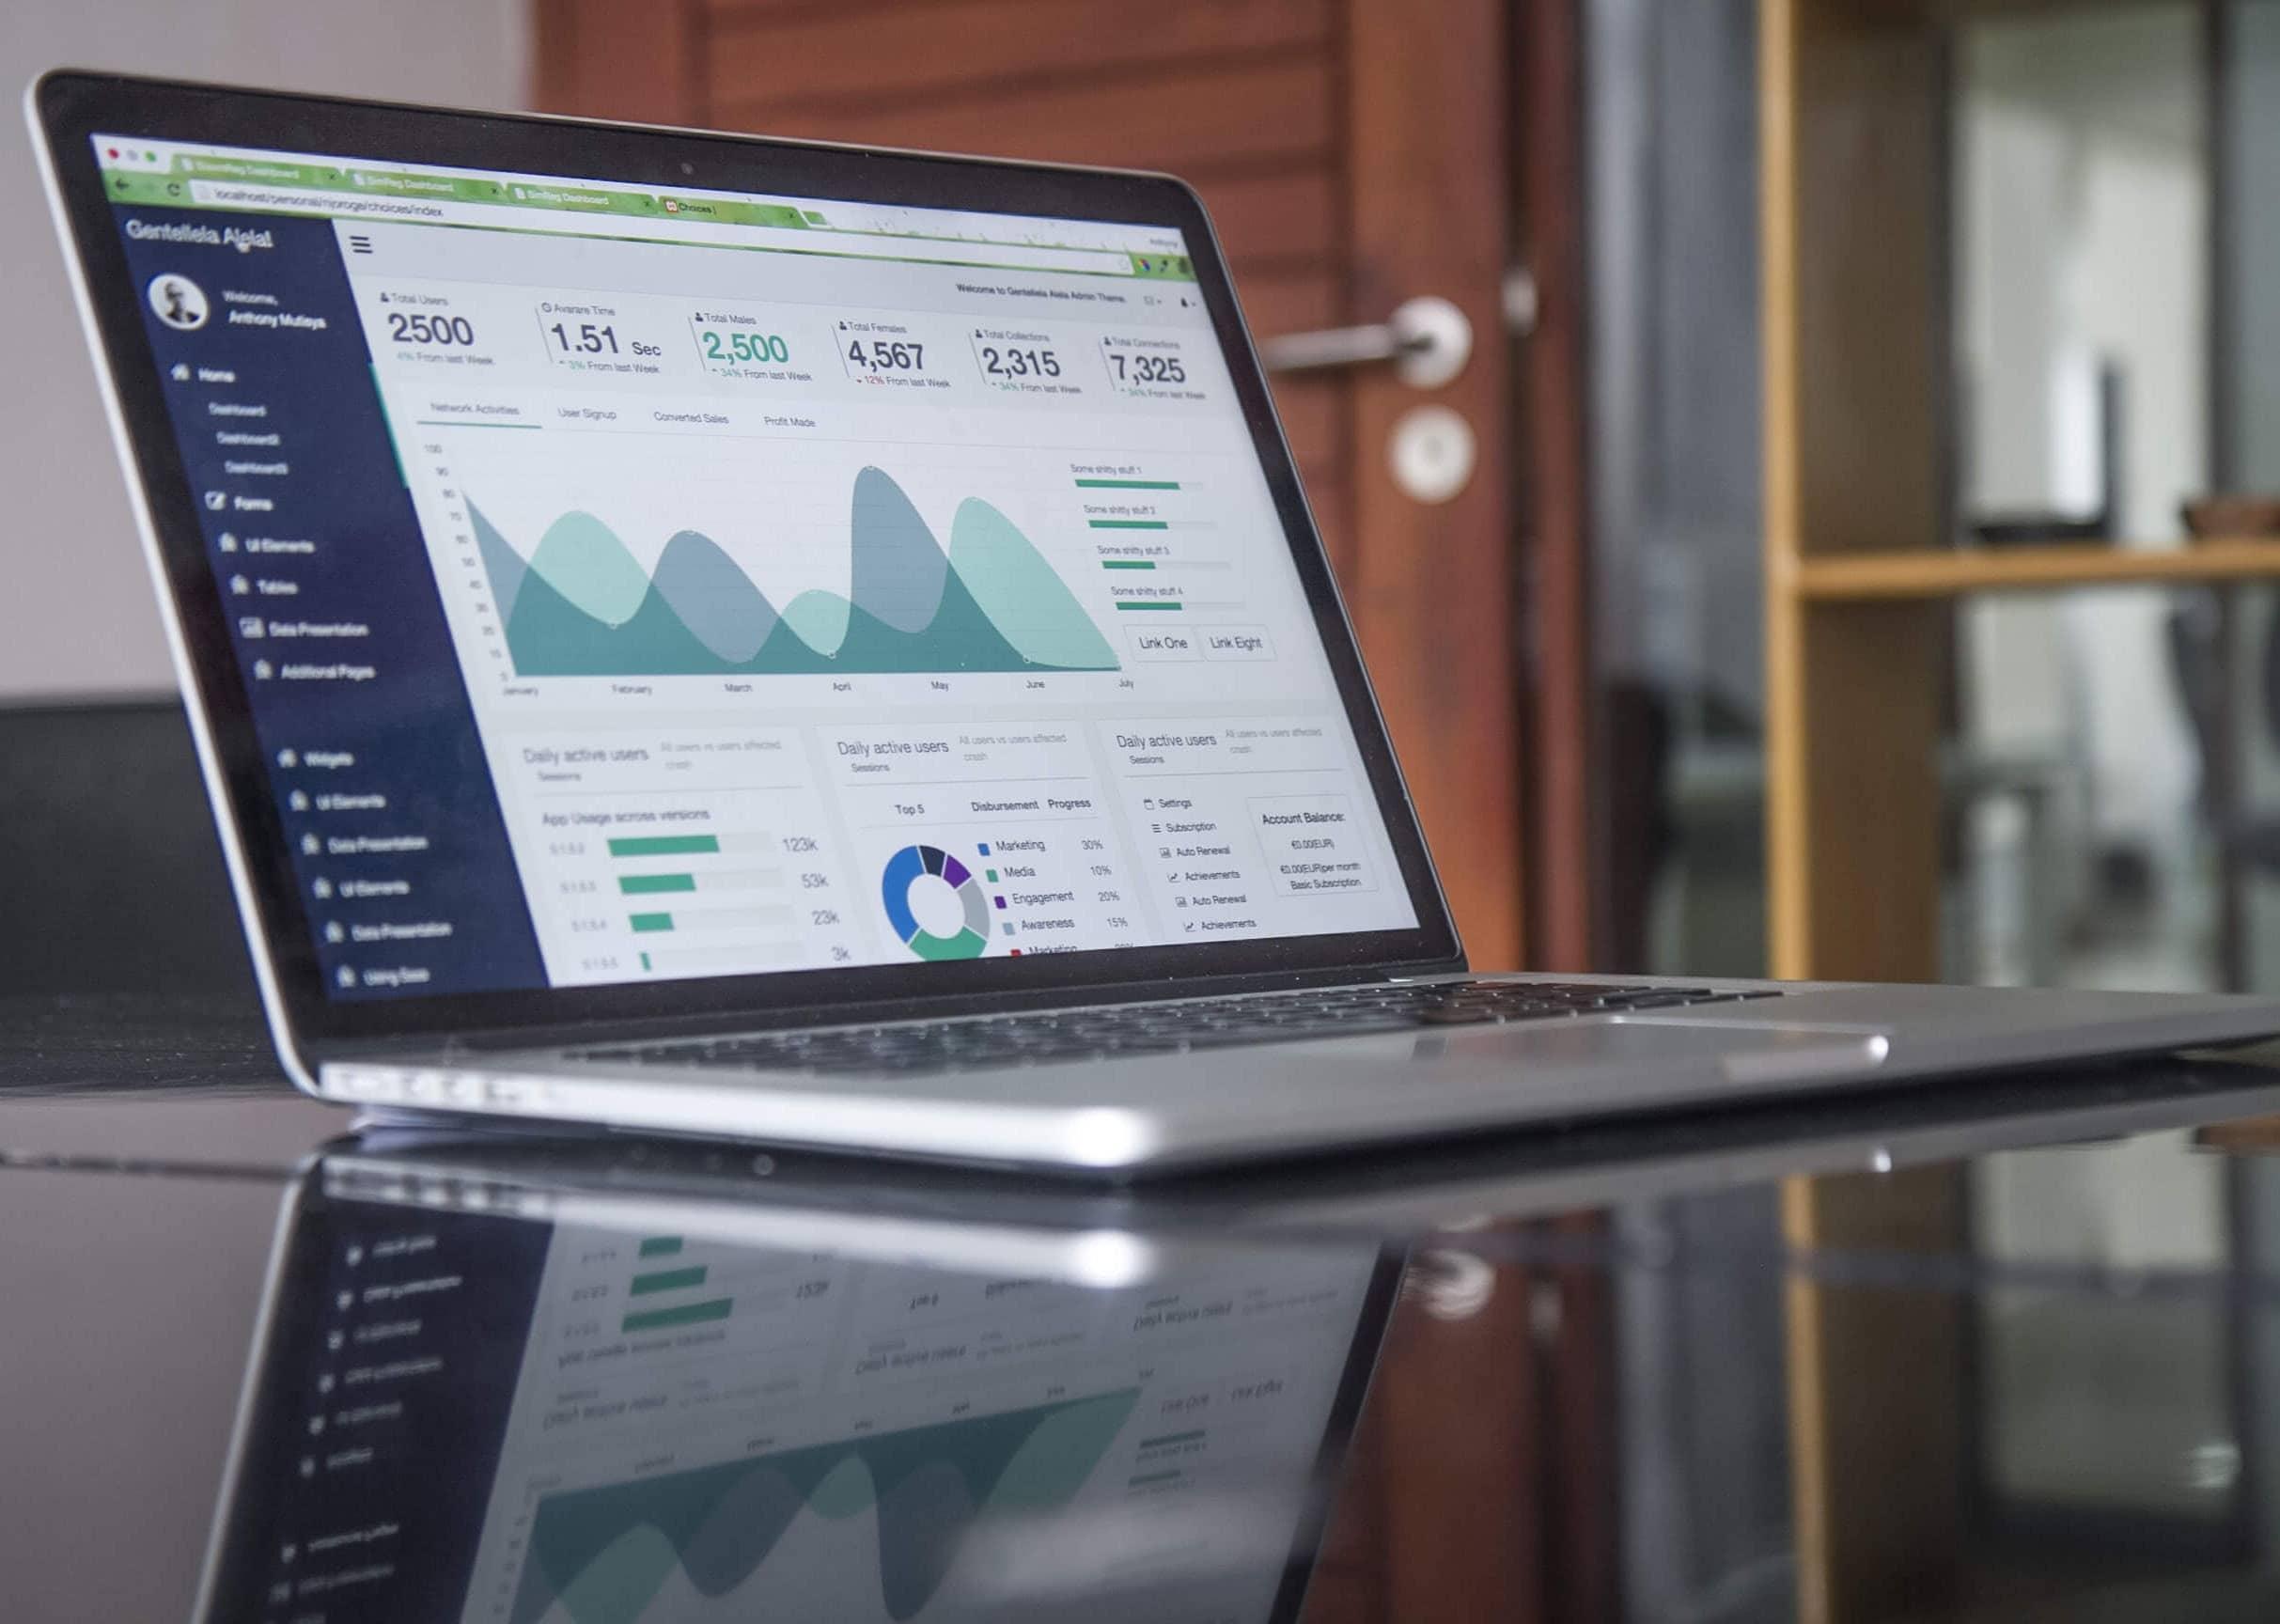 social-media-analytics-on-laptop